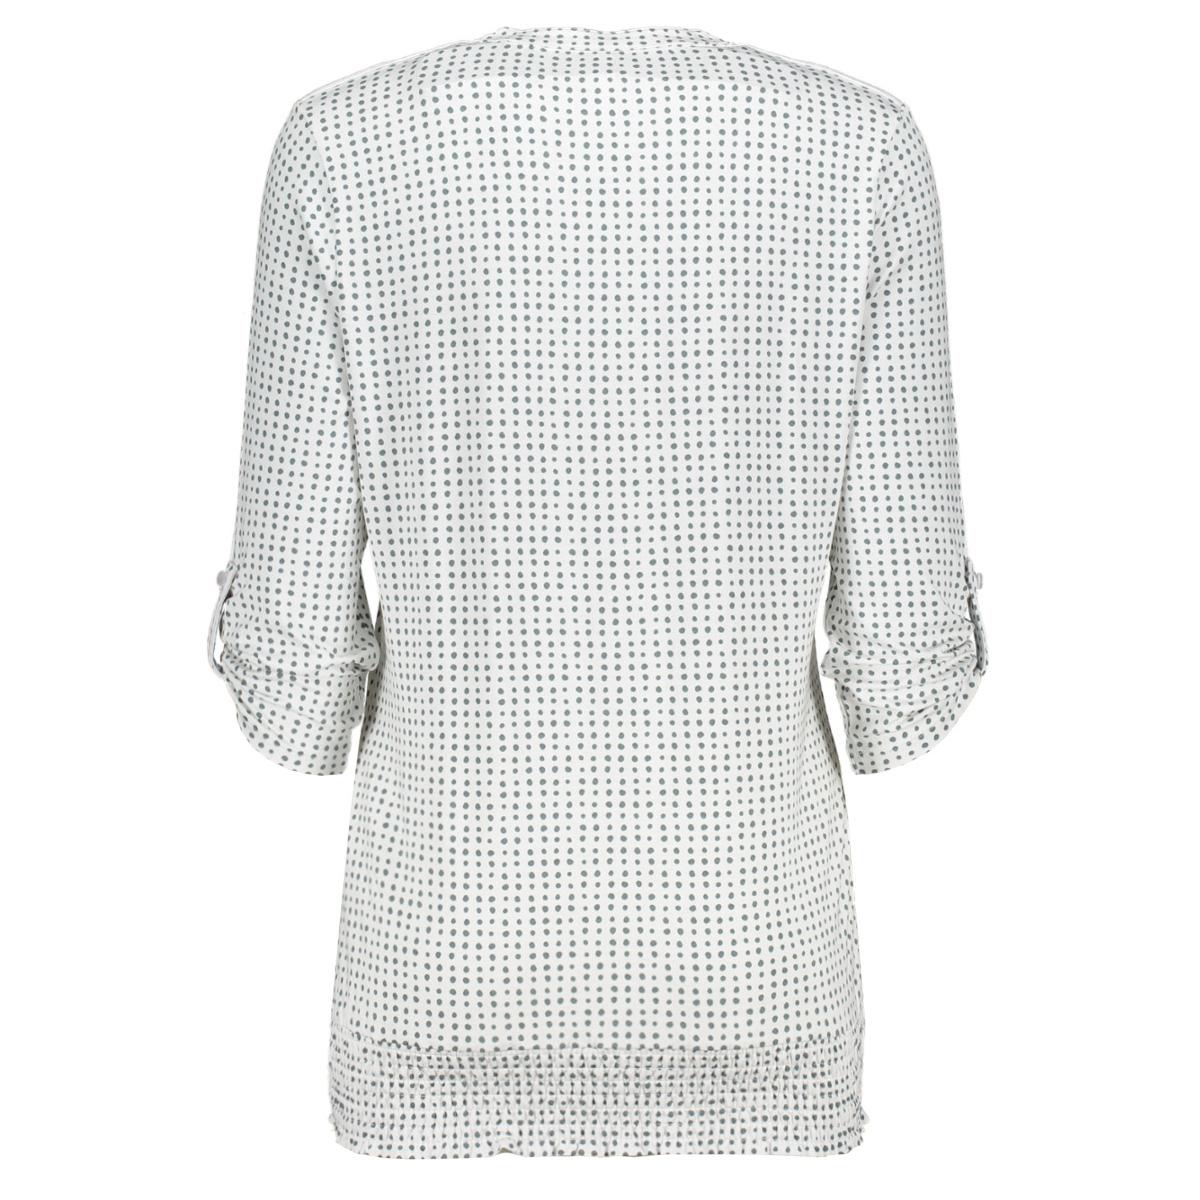 linda blouse with dots print 202 zoso blouse white/greenstone